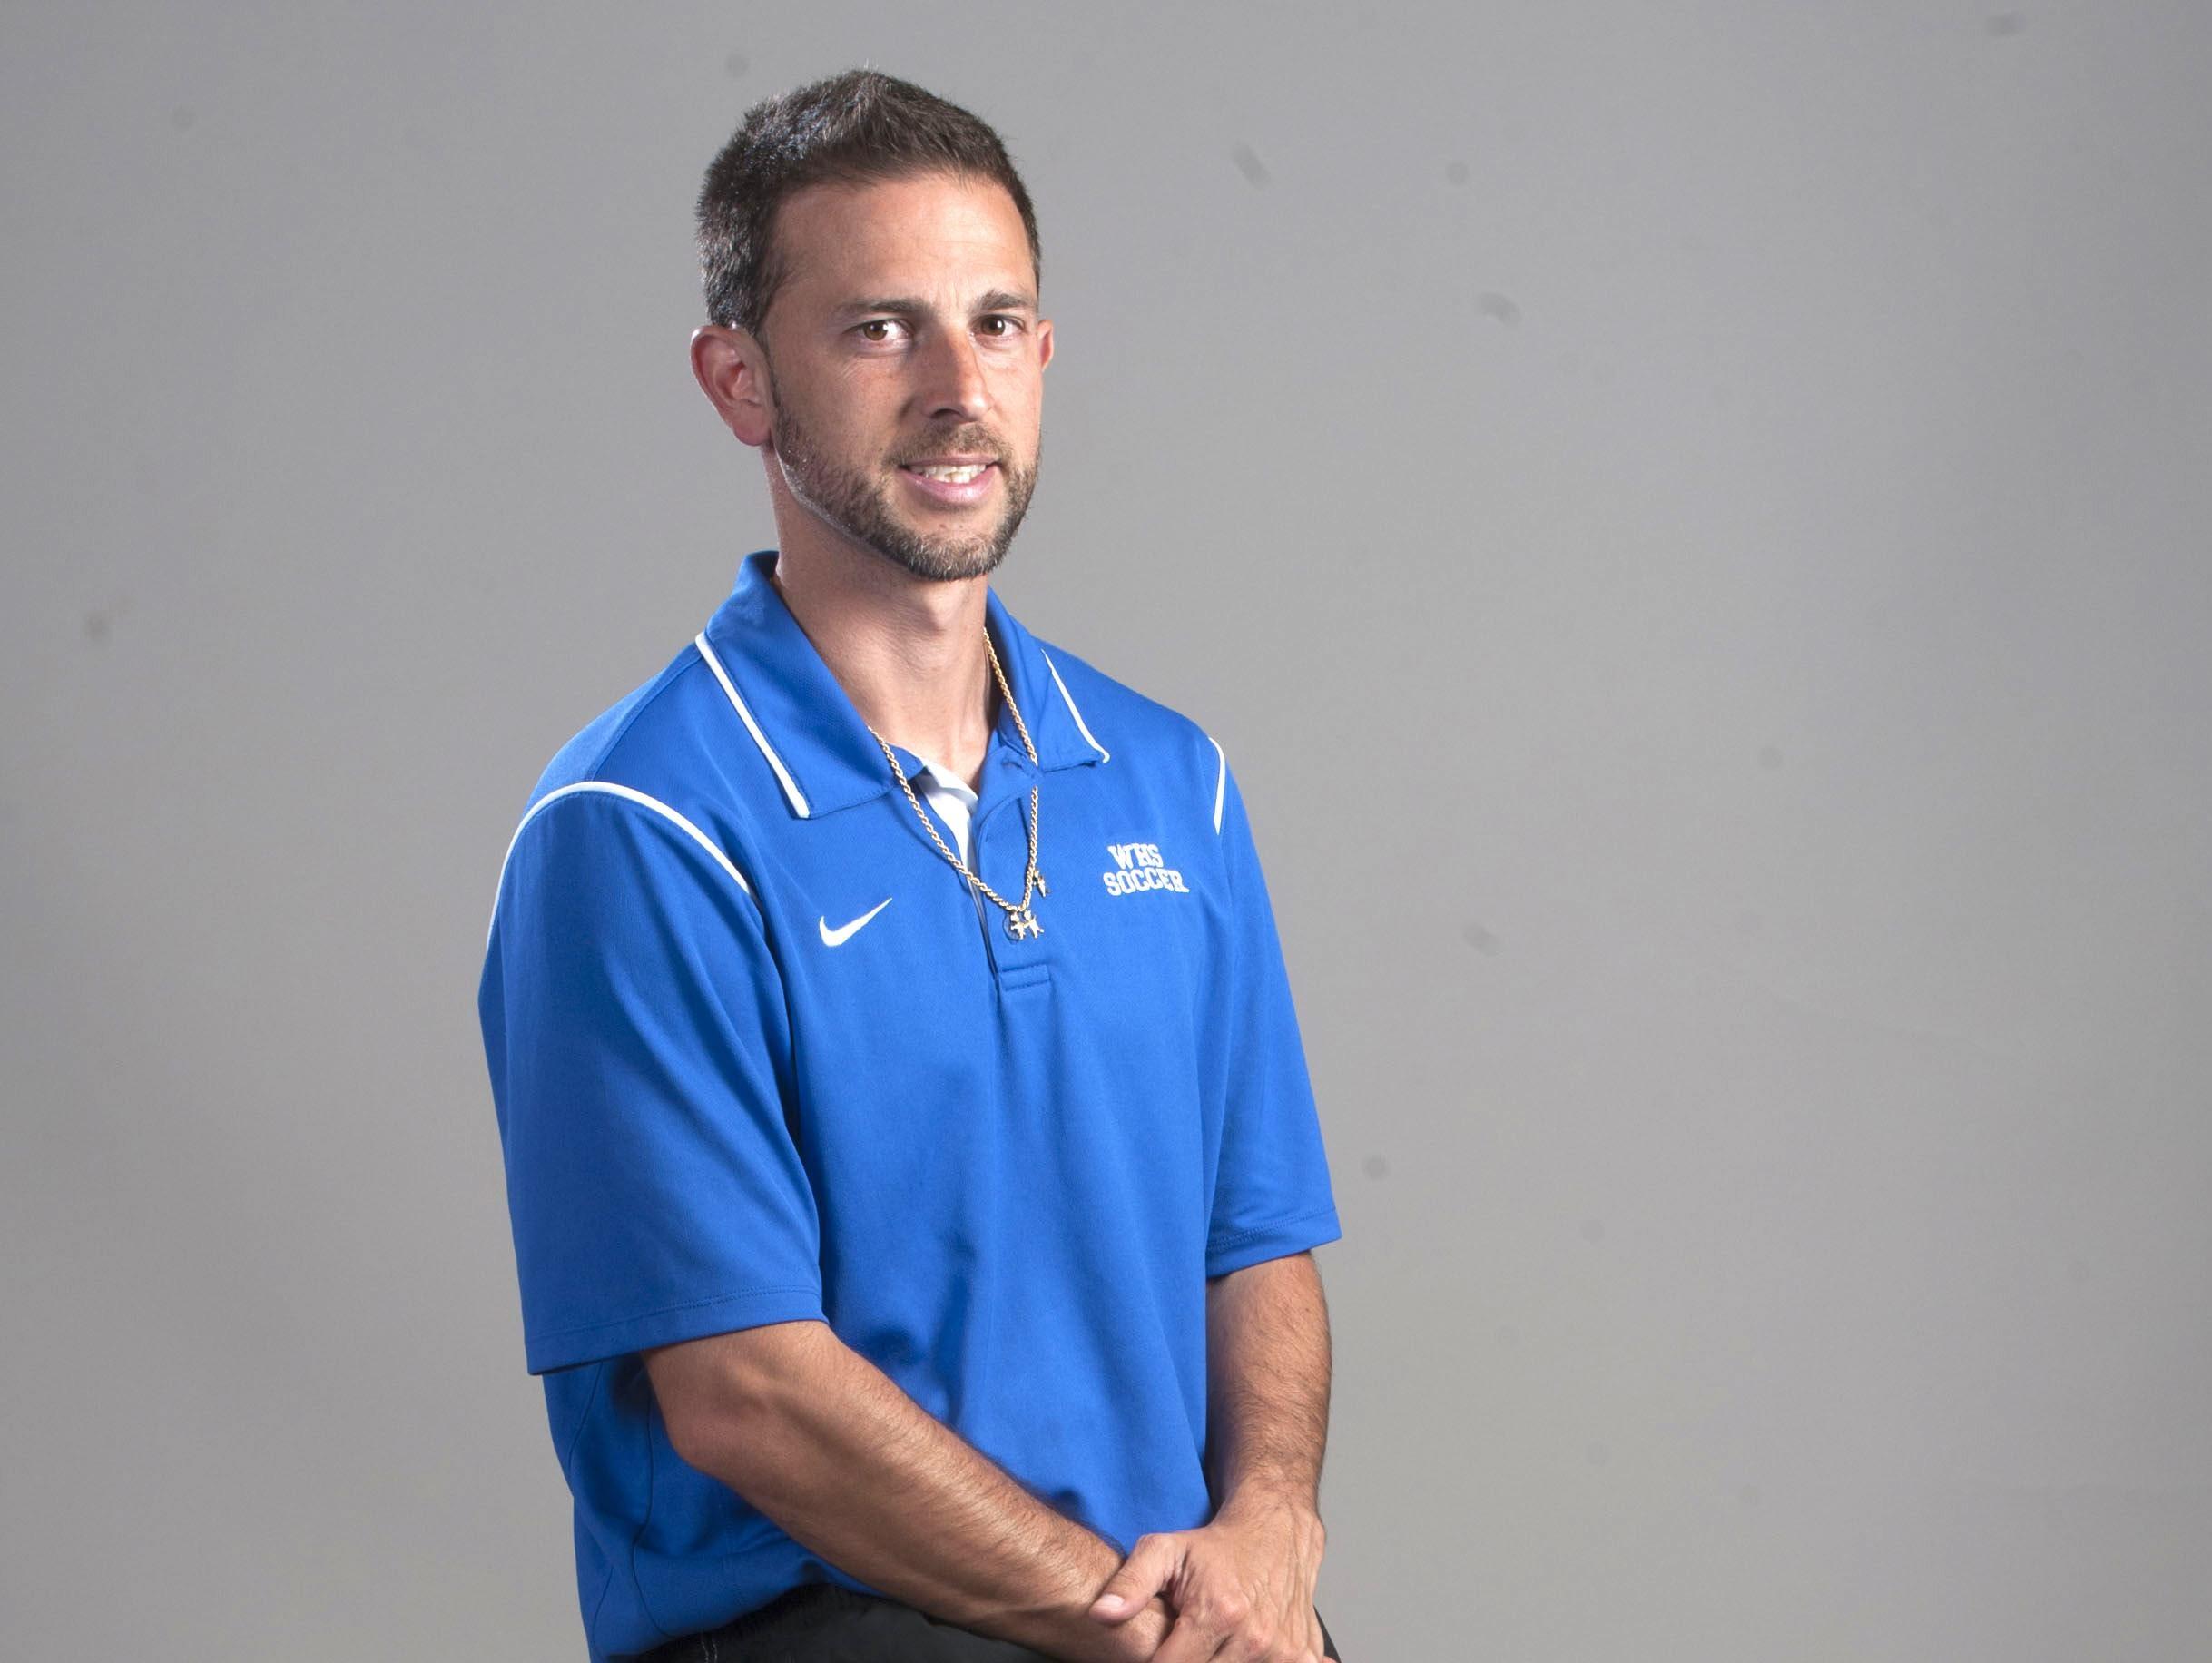 Washington High Soccer Coach Felipe Lawall.